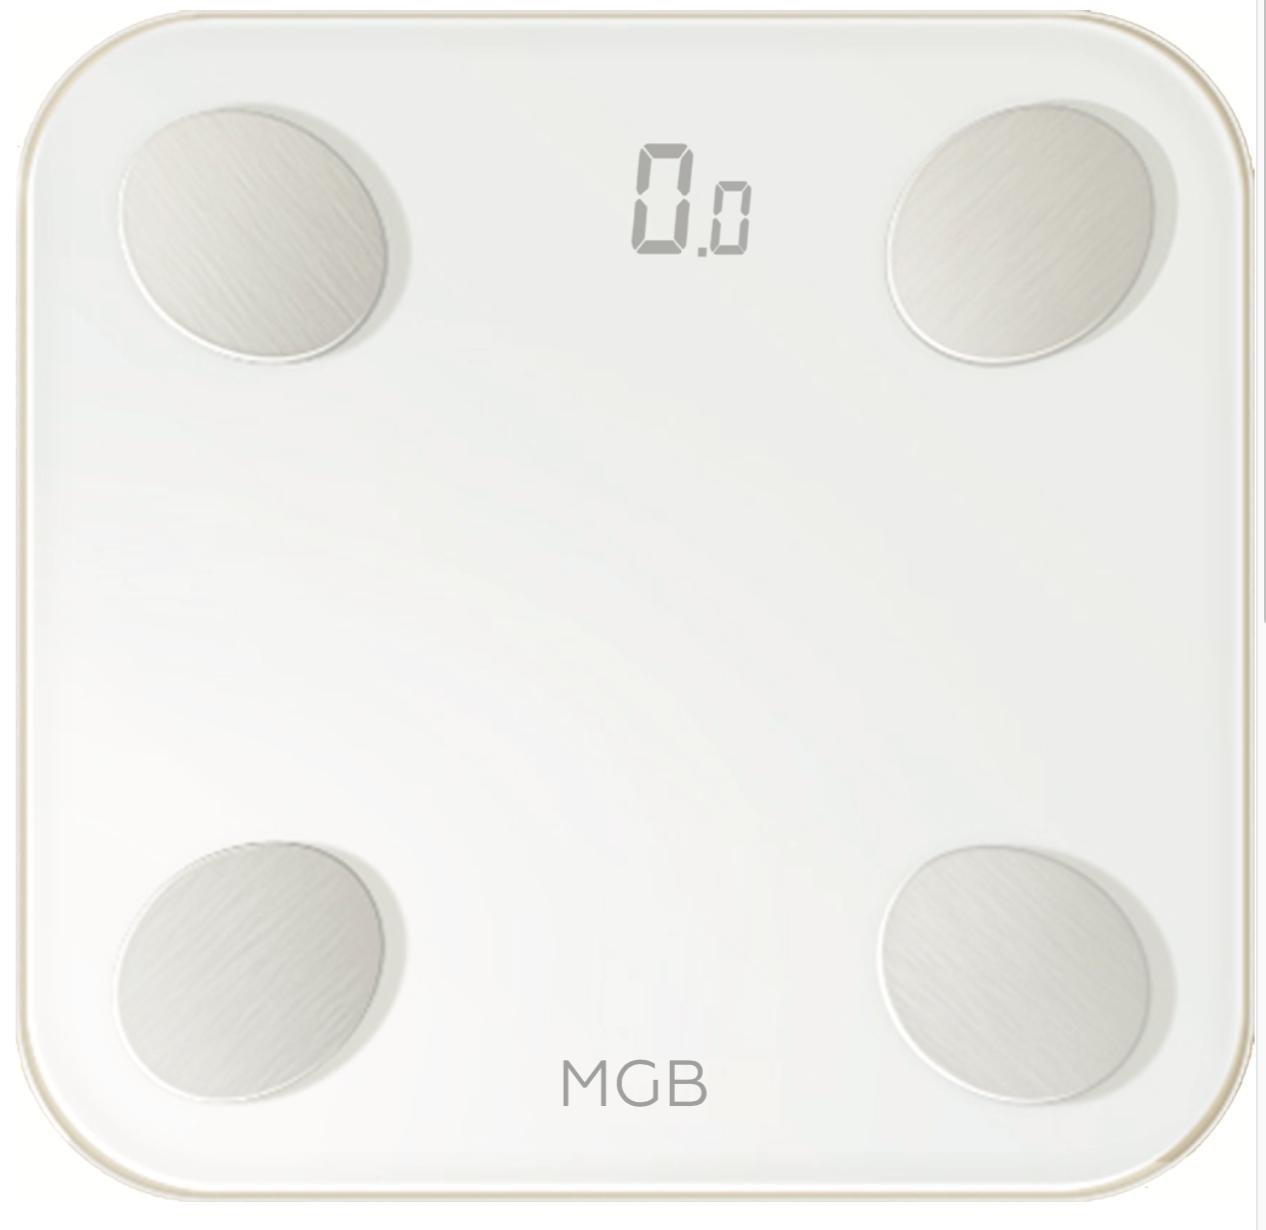 Умные весы MGB Body fat scale Glass Edition-White (уценка, вскрытая коробка)